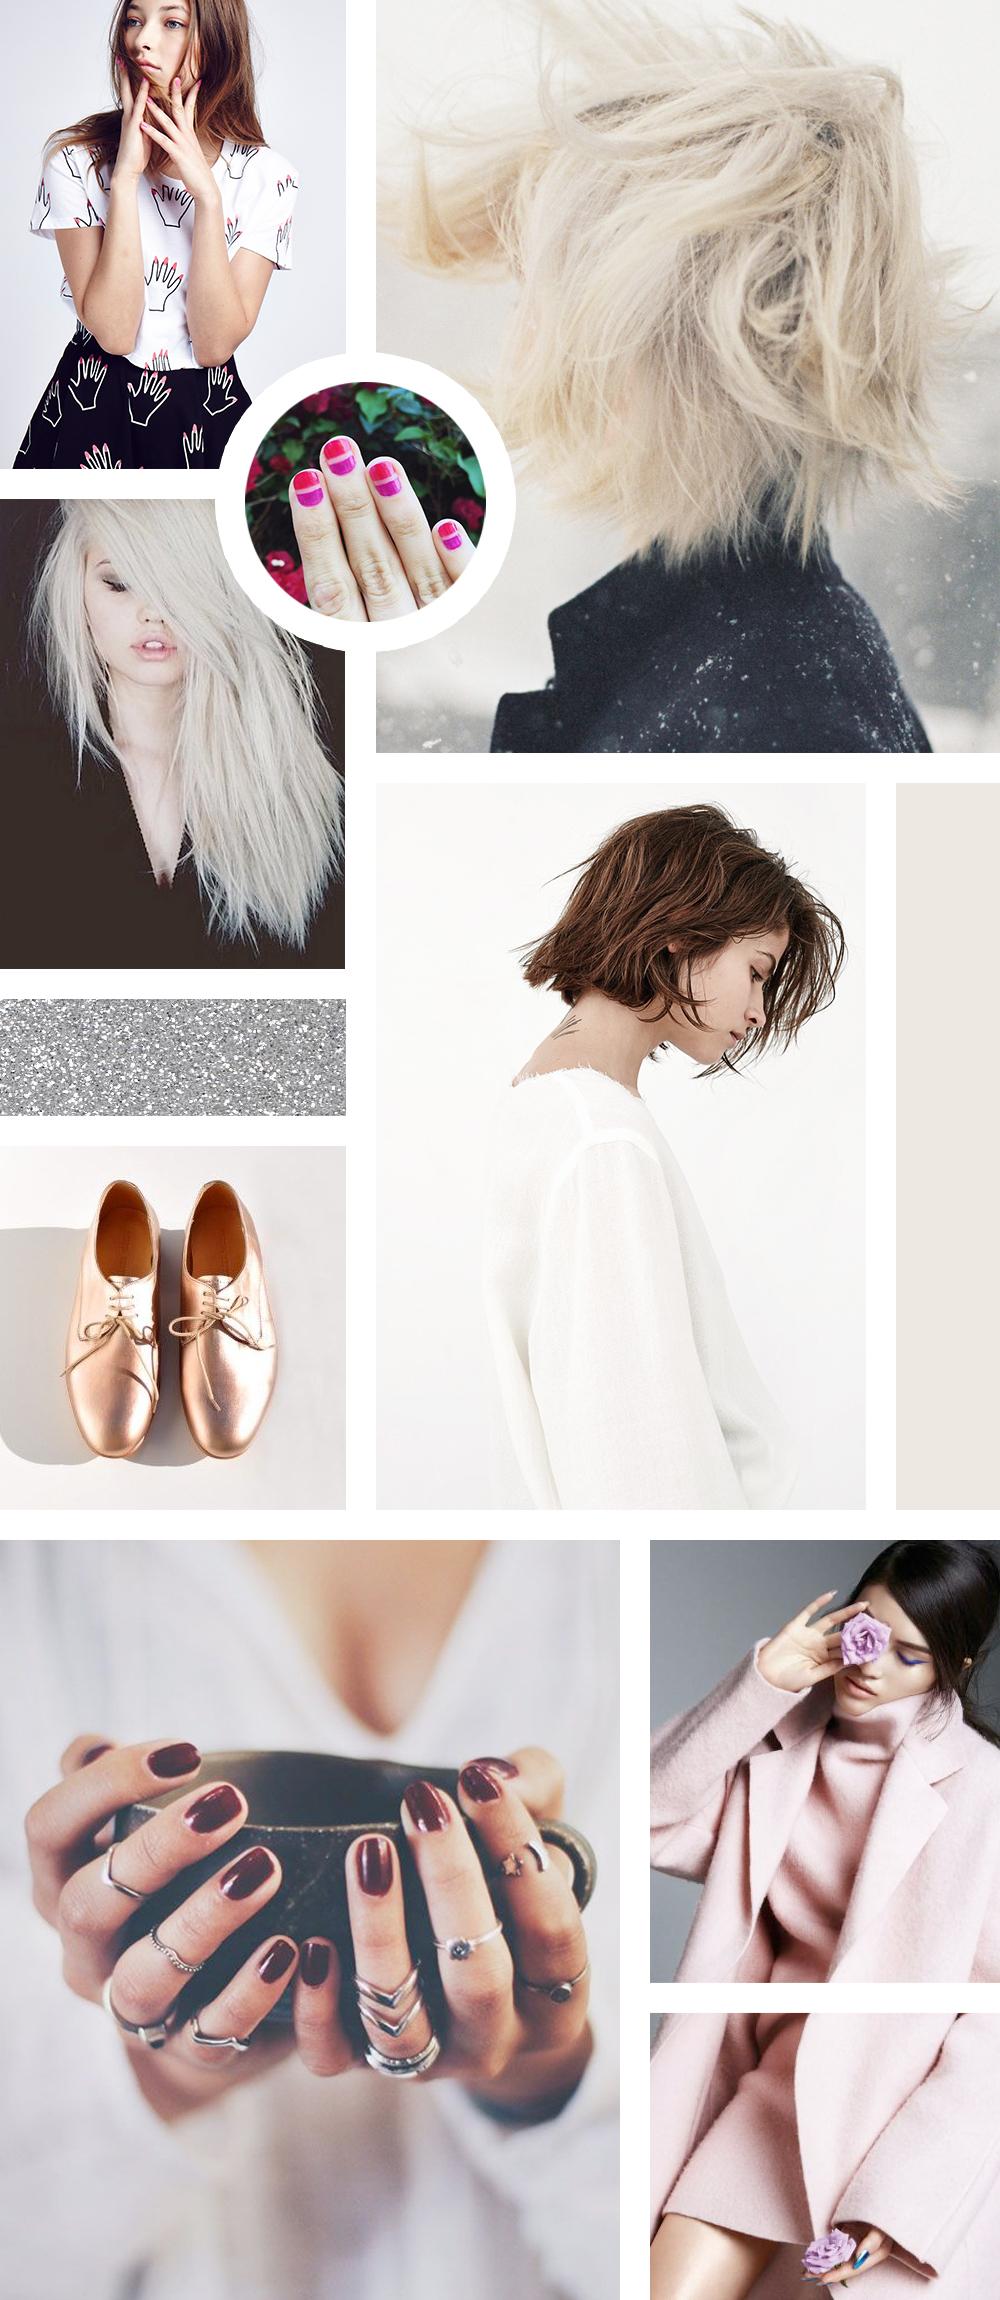 moodboard_style1